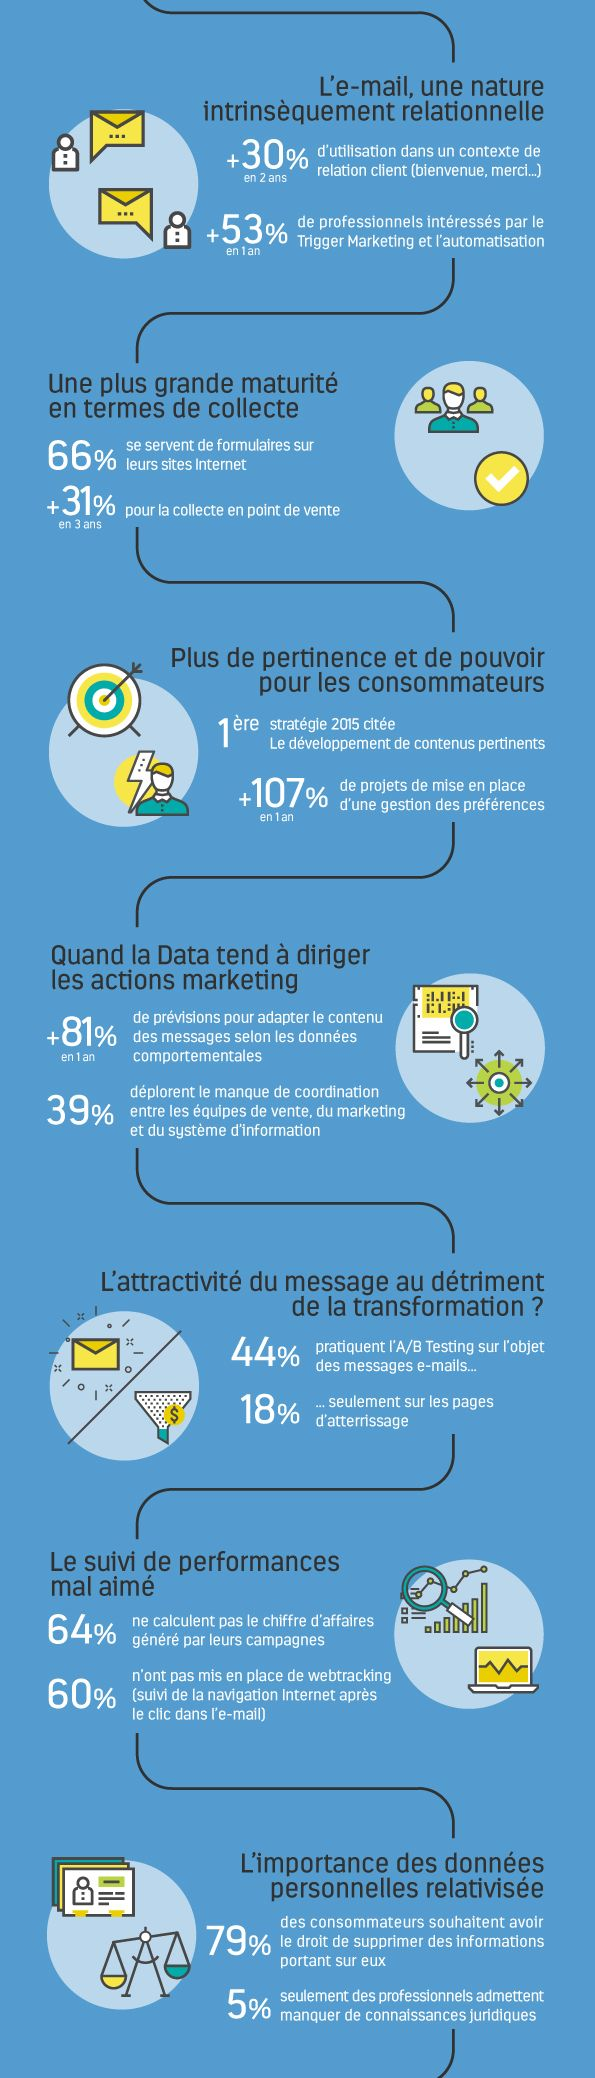 barometre email, tendances data